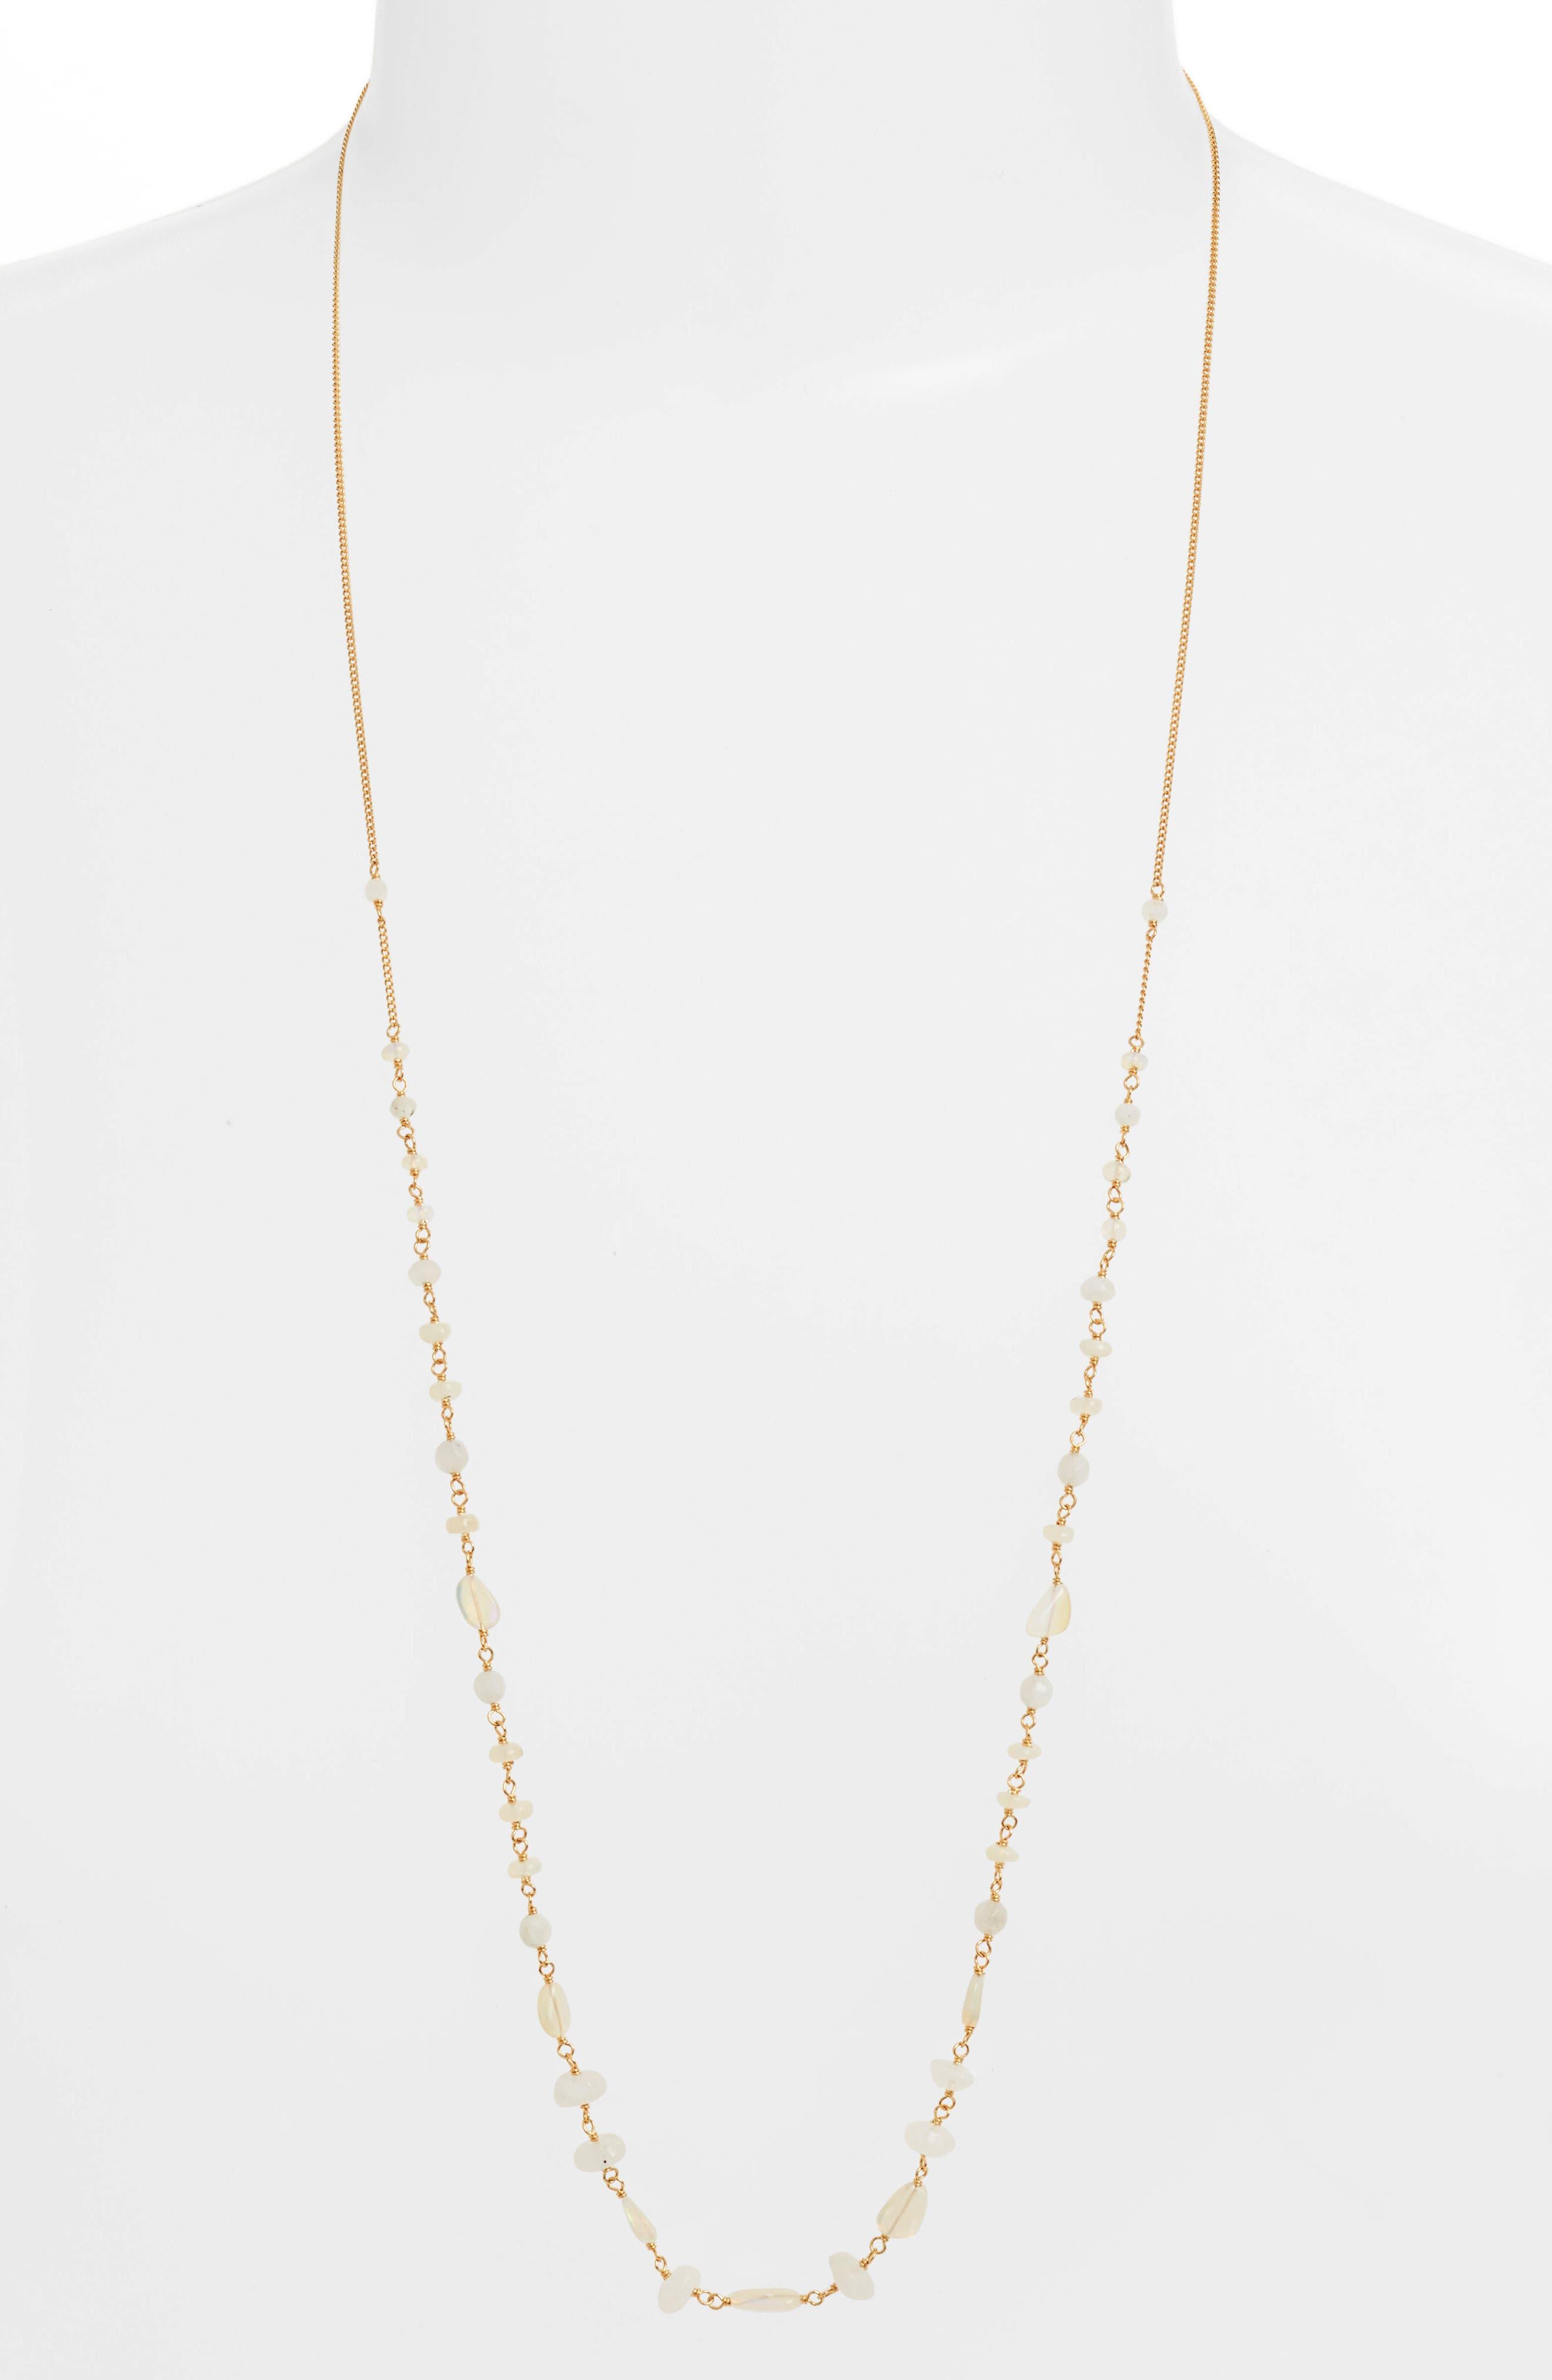 Opal Layering Necklace,                         Main,                         color, ETHIOPIAN OPAL